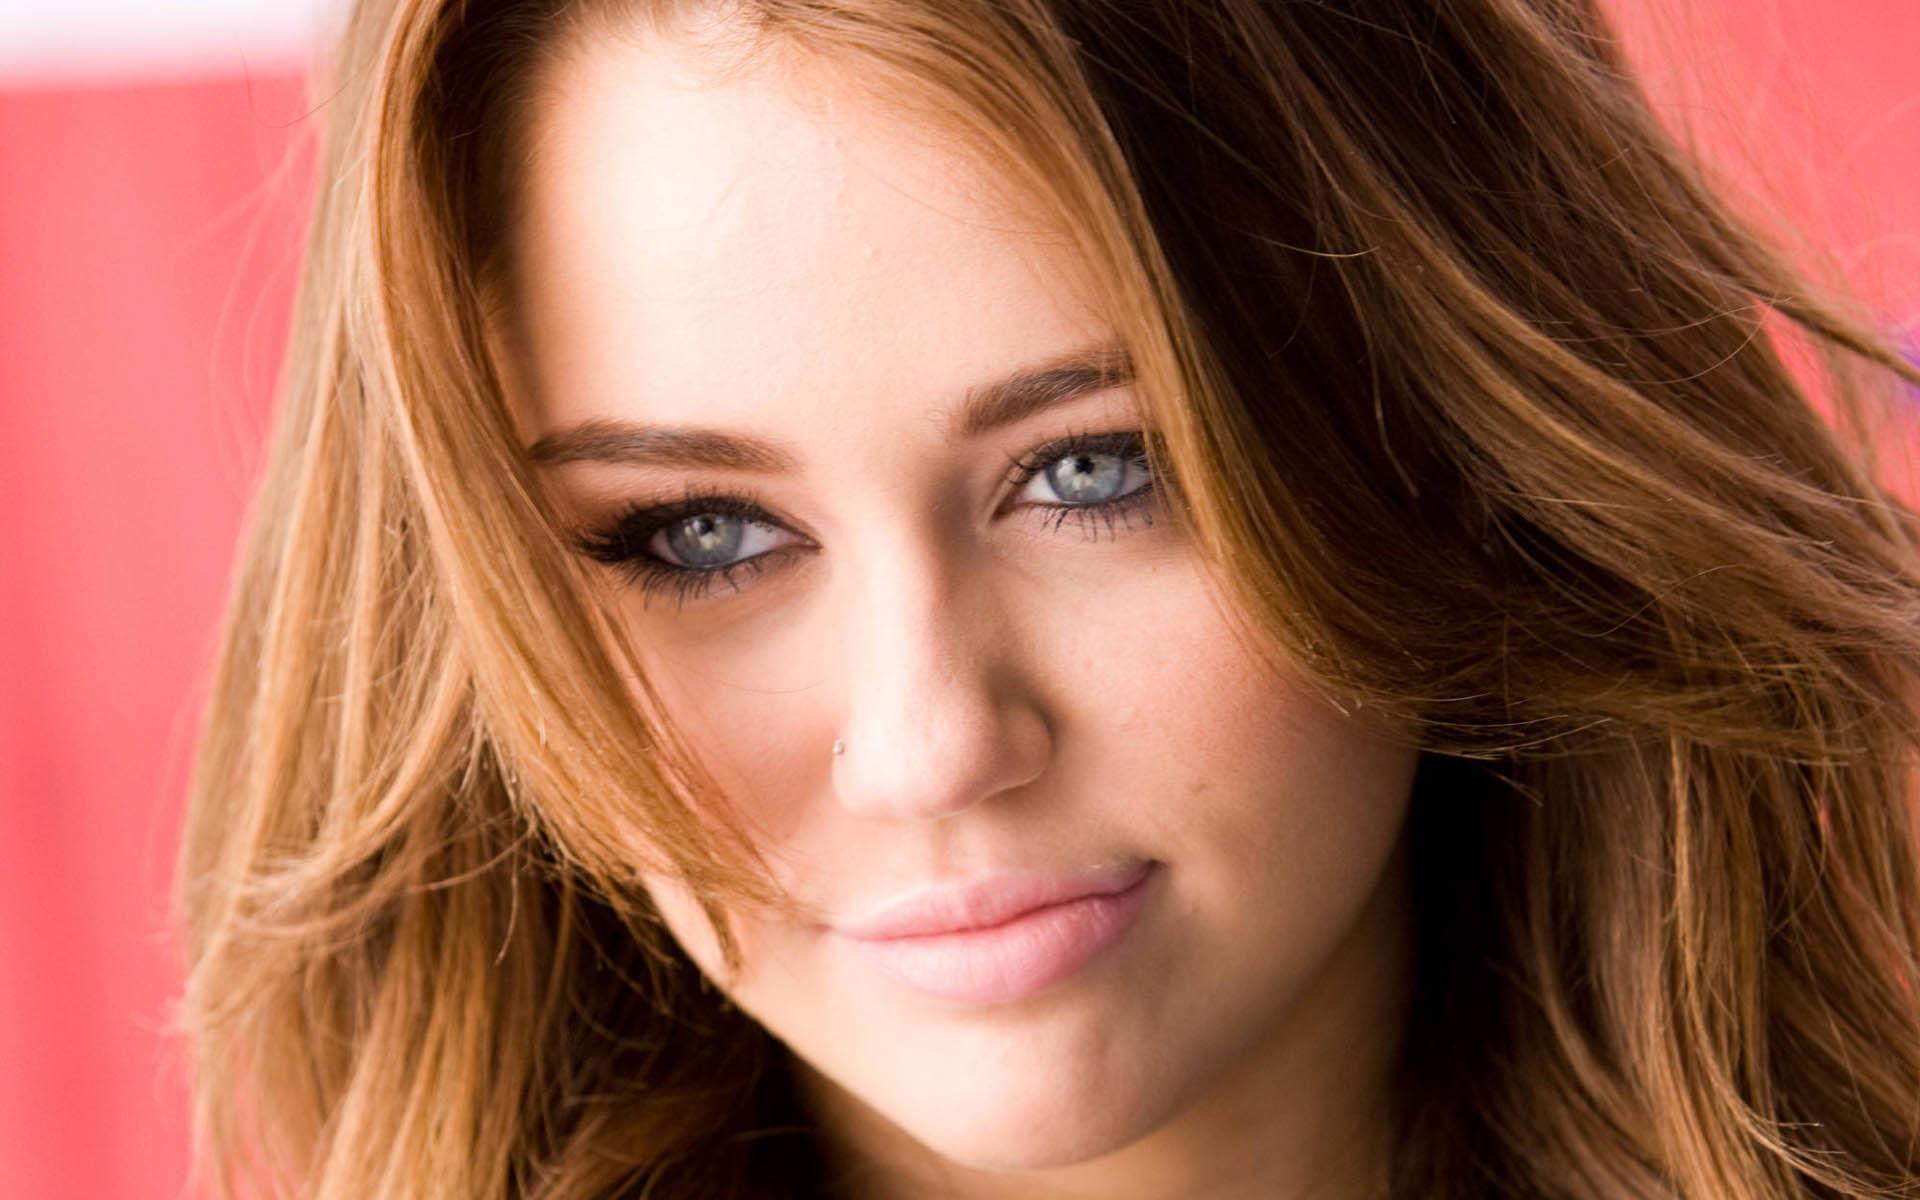 miley-cyrus-hd-wallpapers-6 | Miley Cyrus HD Wallpapers | Pinterest | Miley  cyrus, Hd wallpaper and Pretty people